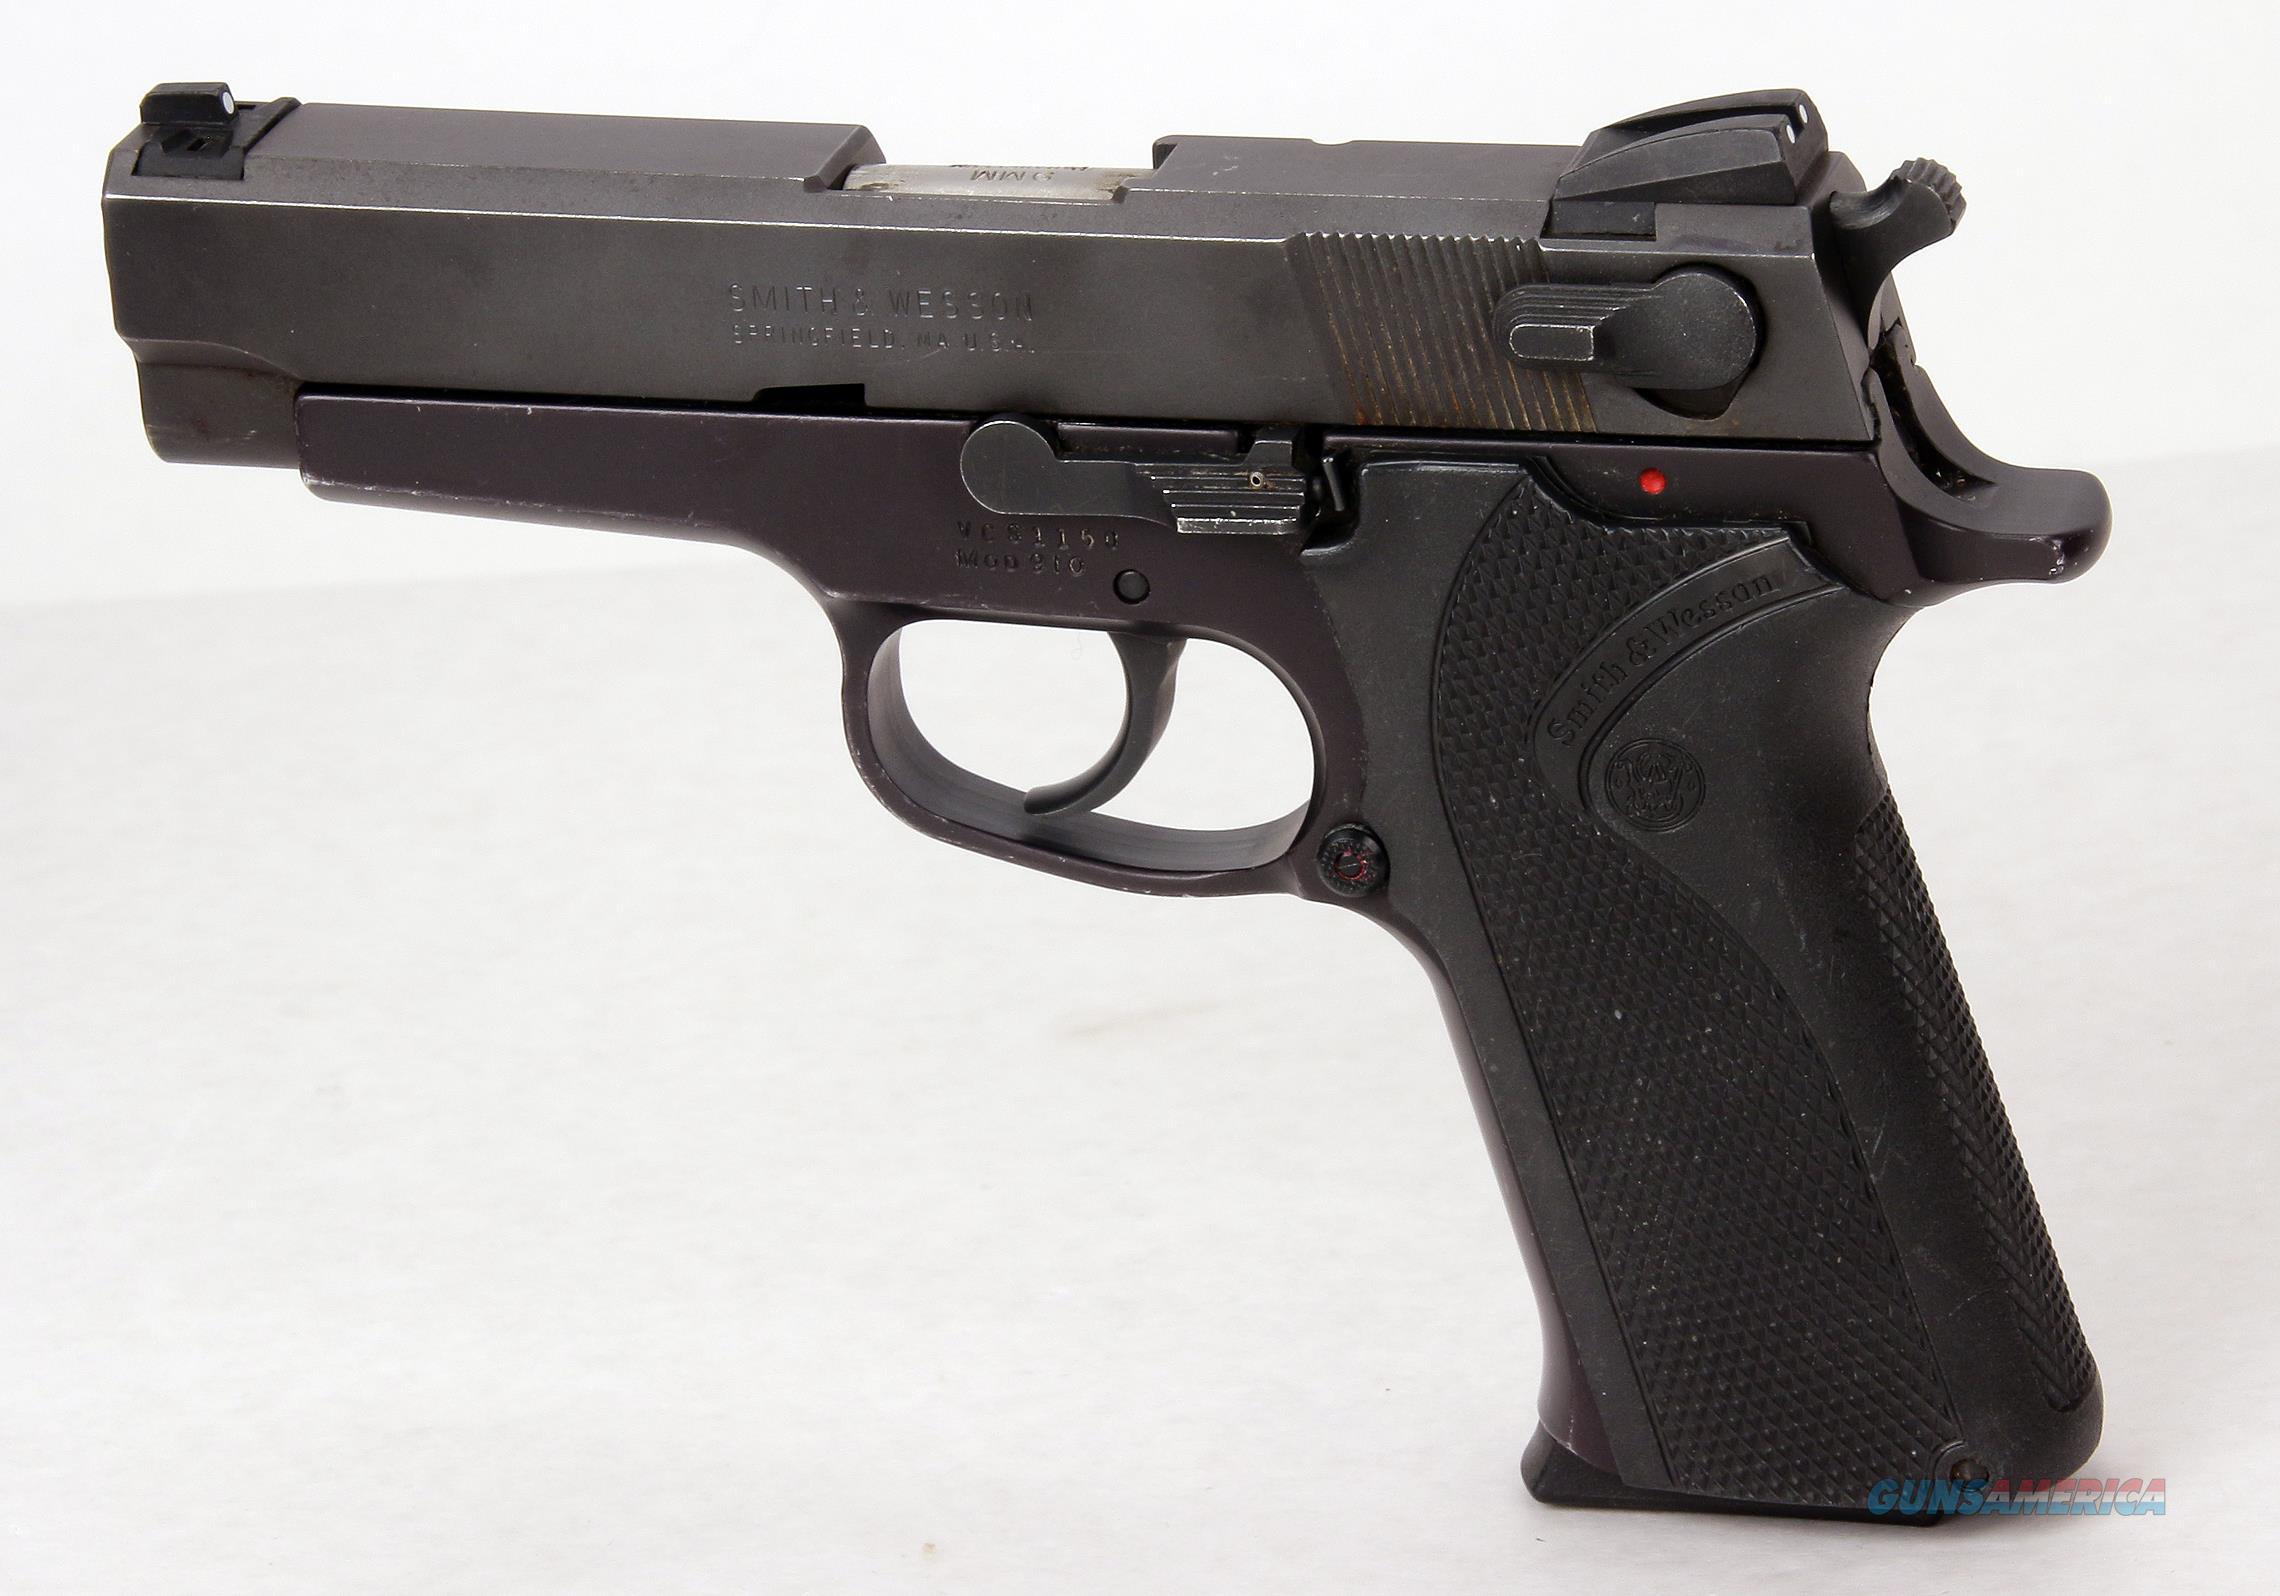 Smith & Wesson 9mm Model 910 Pistol  Guns > Pistols > Smith & Wesson Pistols - Autos > Alloy Frame